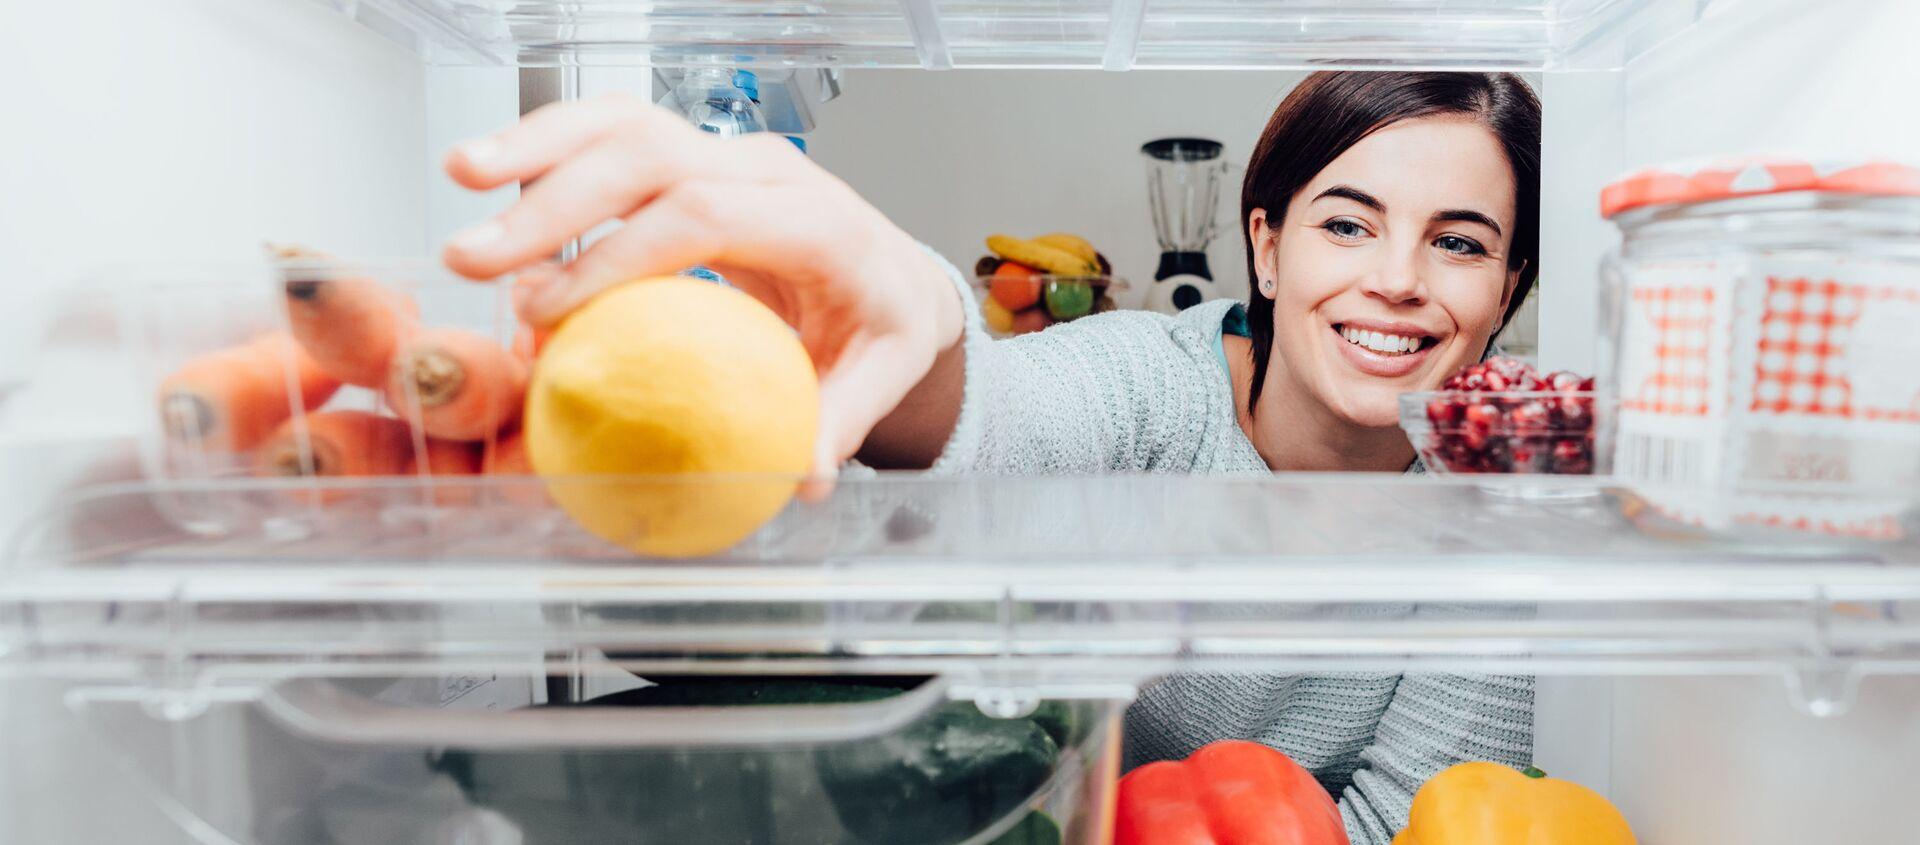 Ragazza prende un limone dal frigorifero - Sputnik Italia, 1920, 02.04.2020